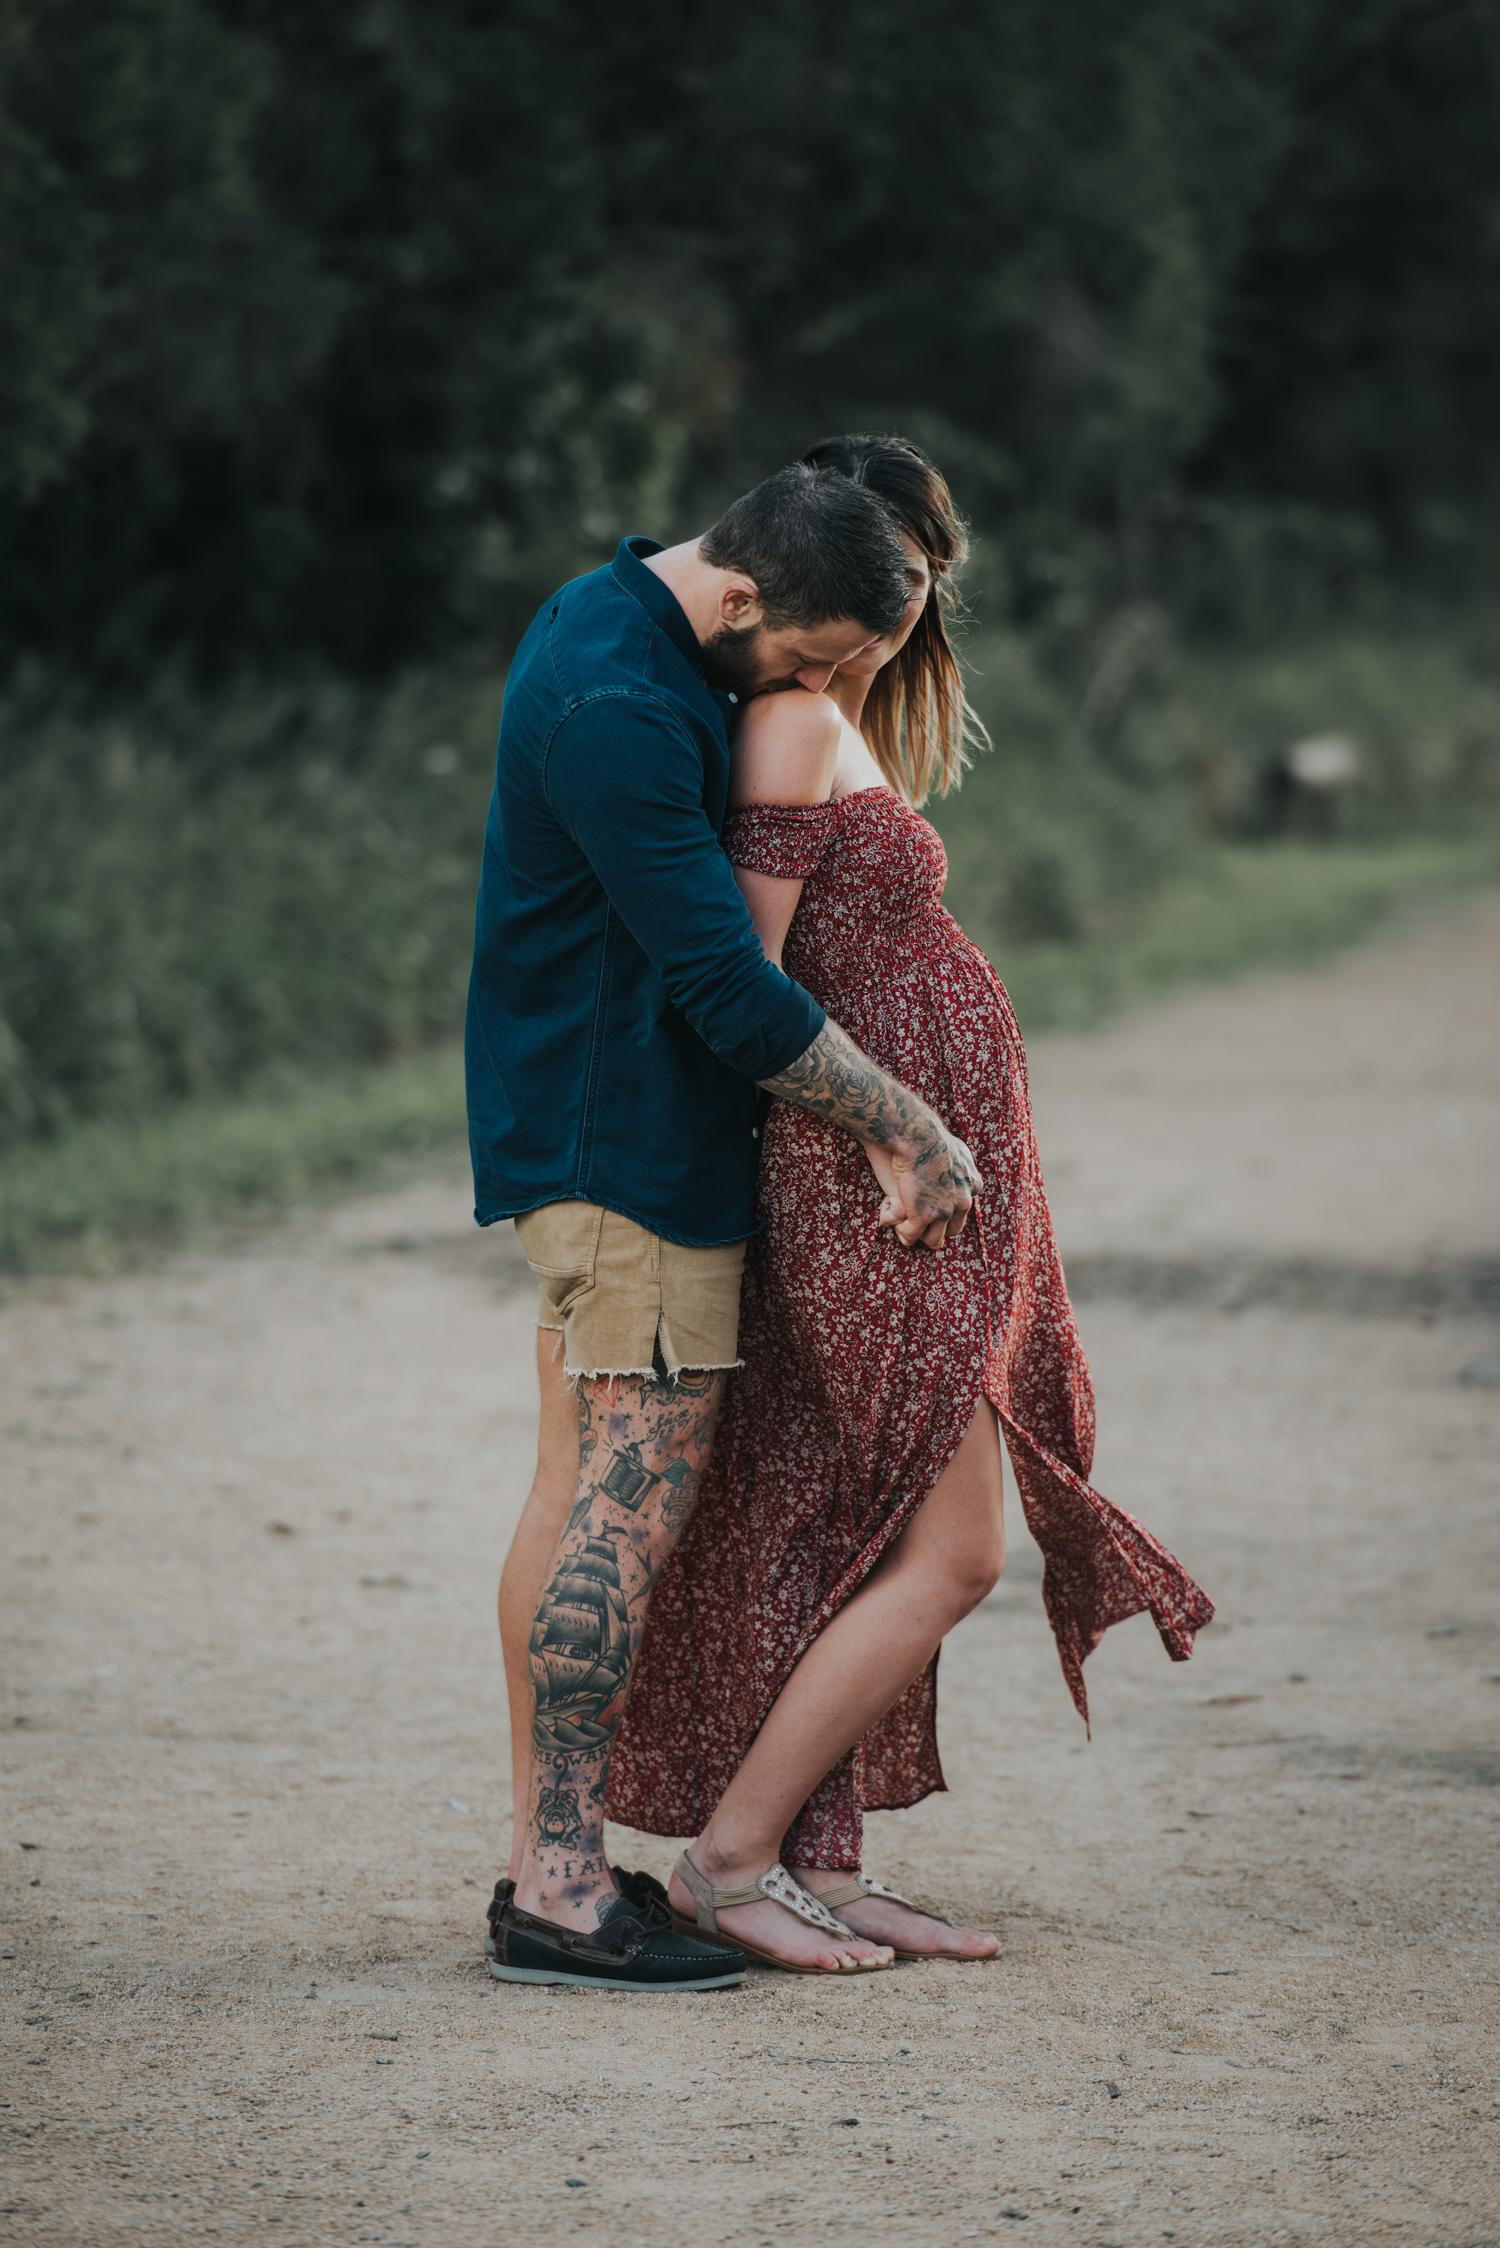 Brisbane Lifestyle Family Photography | Maternity-Newborn Photographer v2-5.jpg